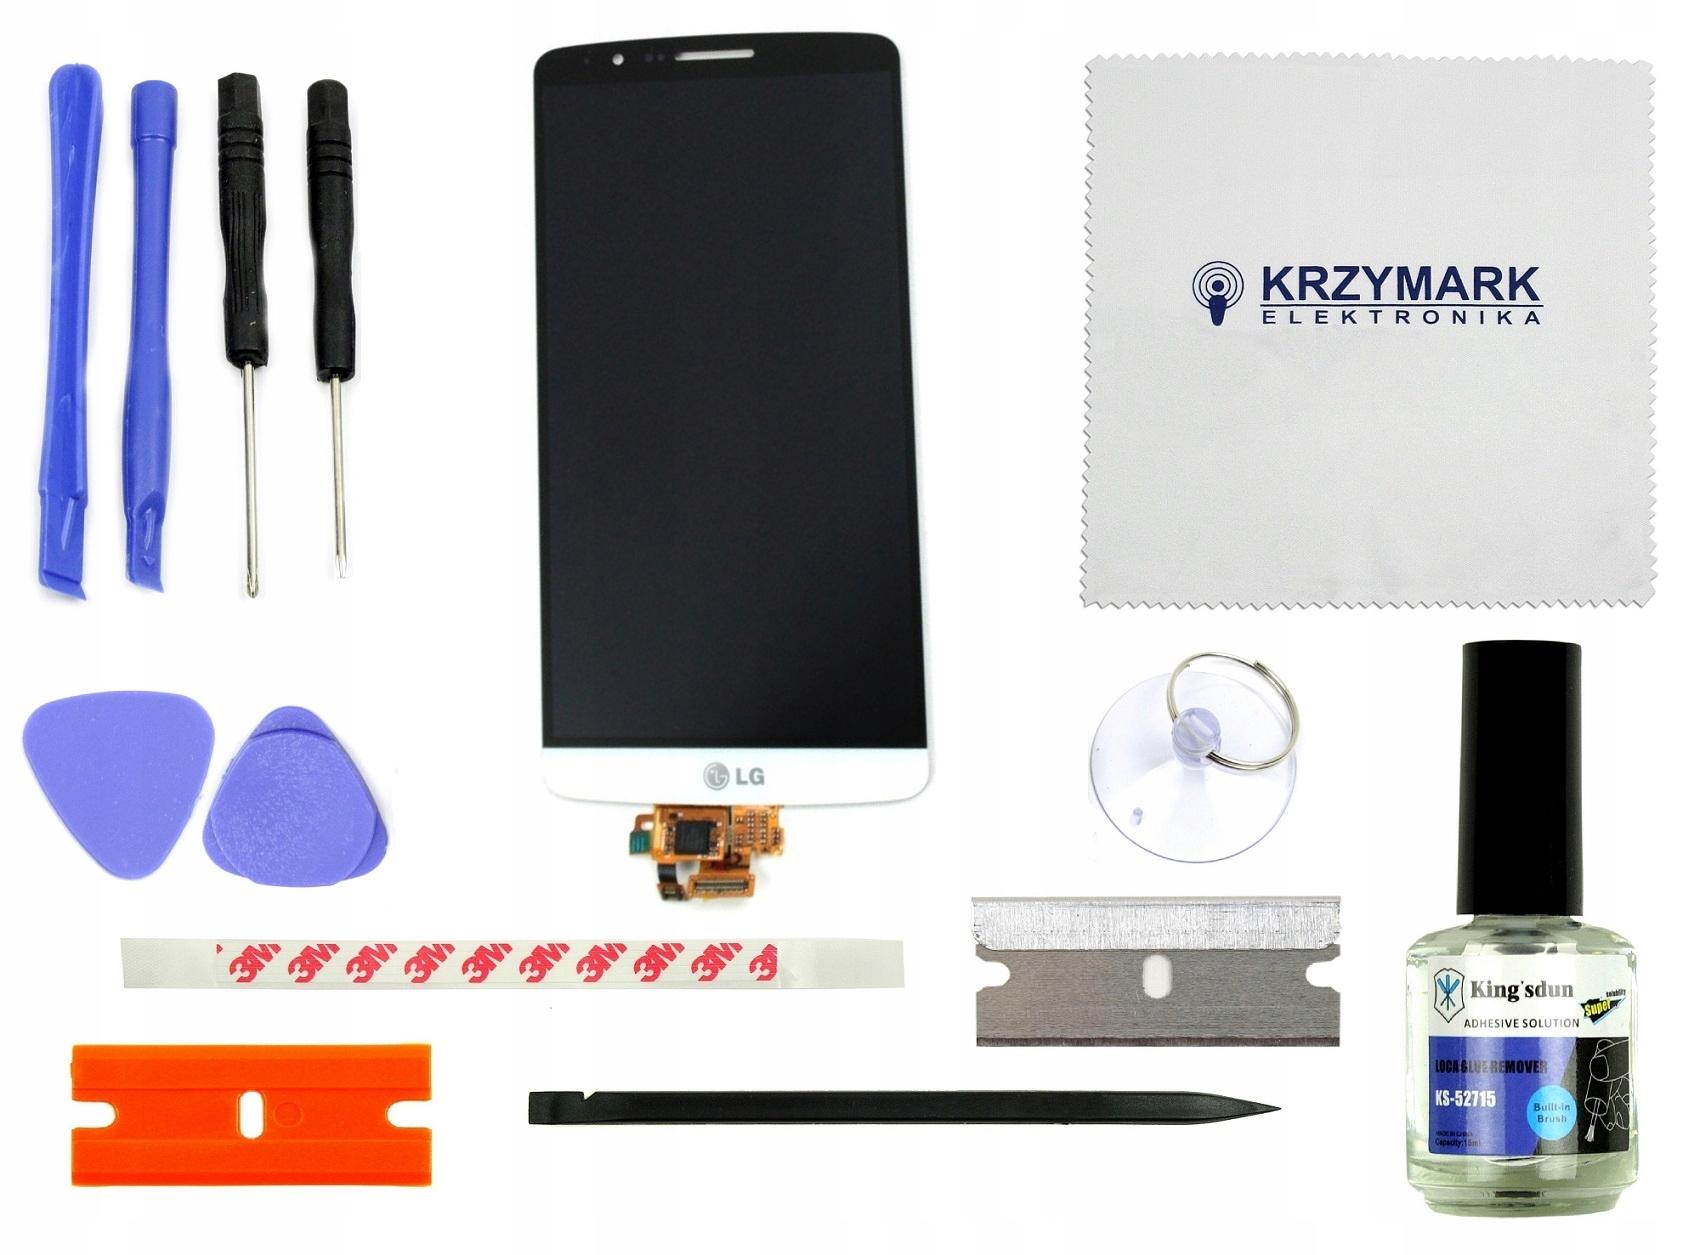 WYŚWIETLACZ LCD DOTYK DO LG G3 D850 D855 G855